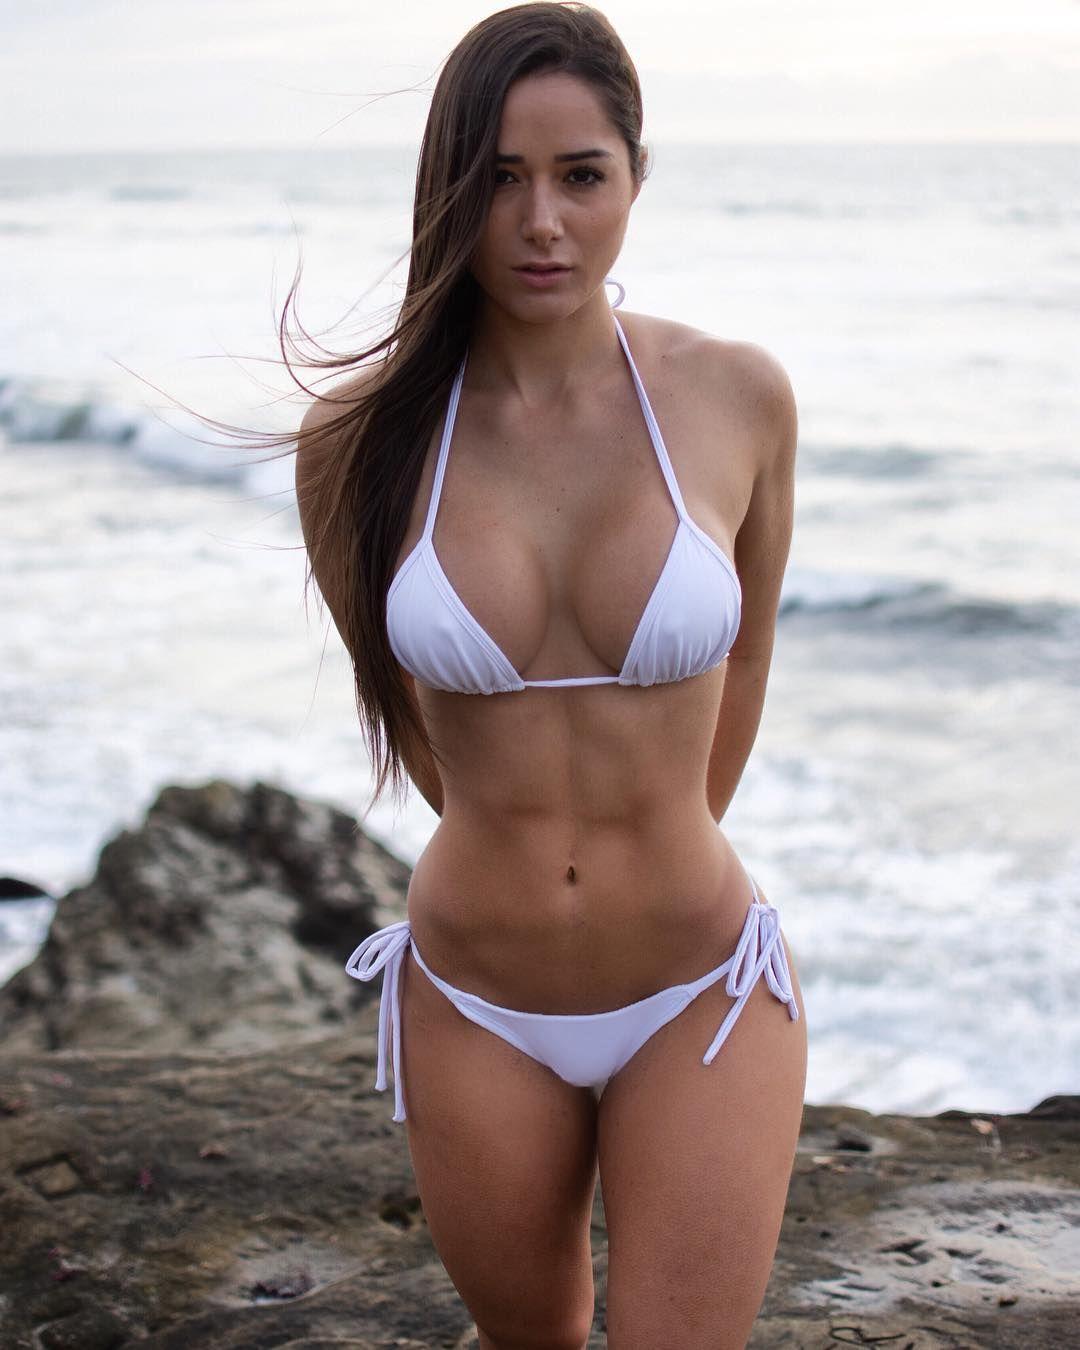 Bikini Bruna Miranda nudes (99 photo), Tits, Paparazzi, Instagram, bra 2015